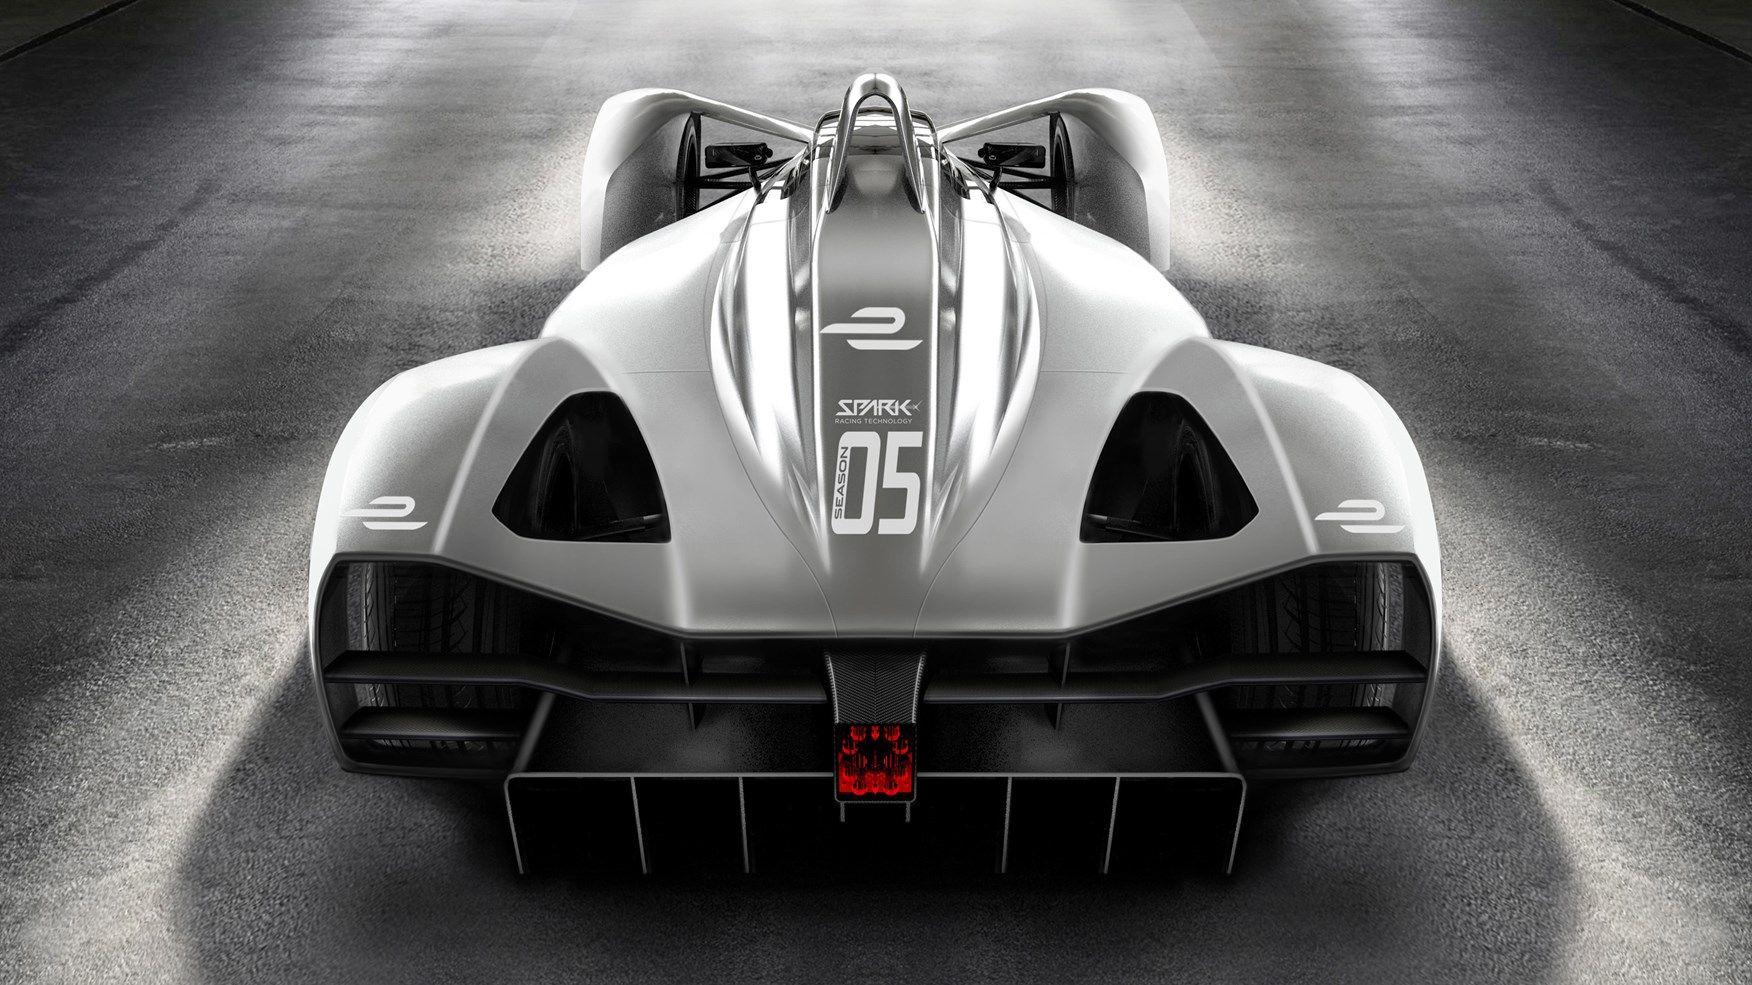 The New Spark Racing Formula E Chassis Car Cars Cardio Carporn Skincare Supercar Cartoon Carswithoutlimits Superc Formula E Race Cars Race Car Chassis